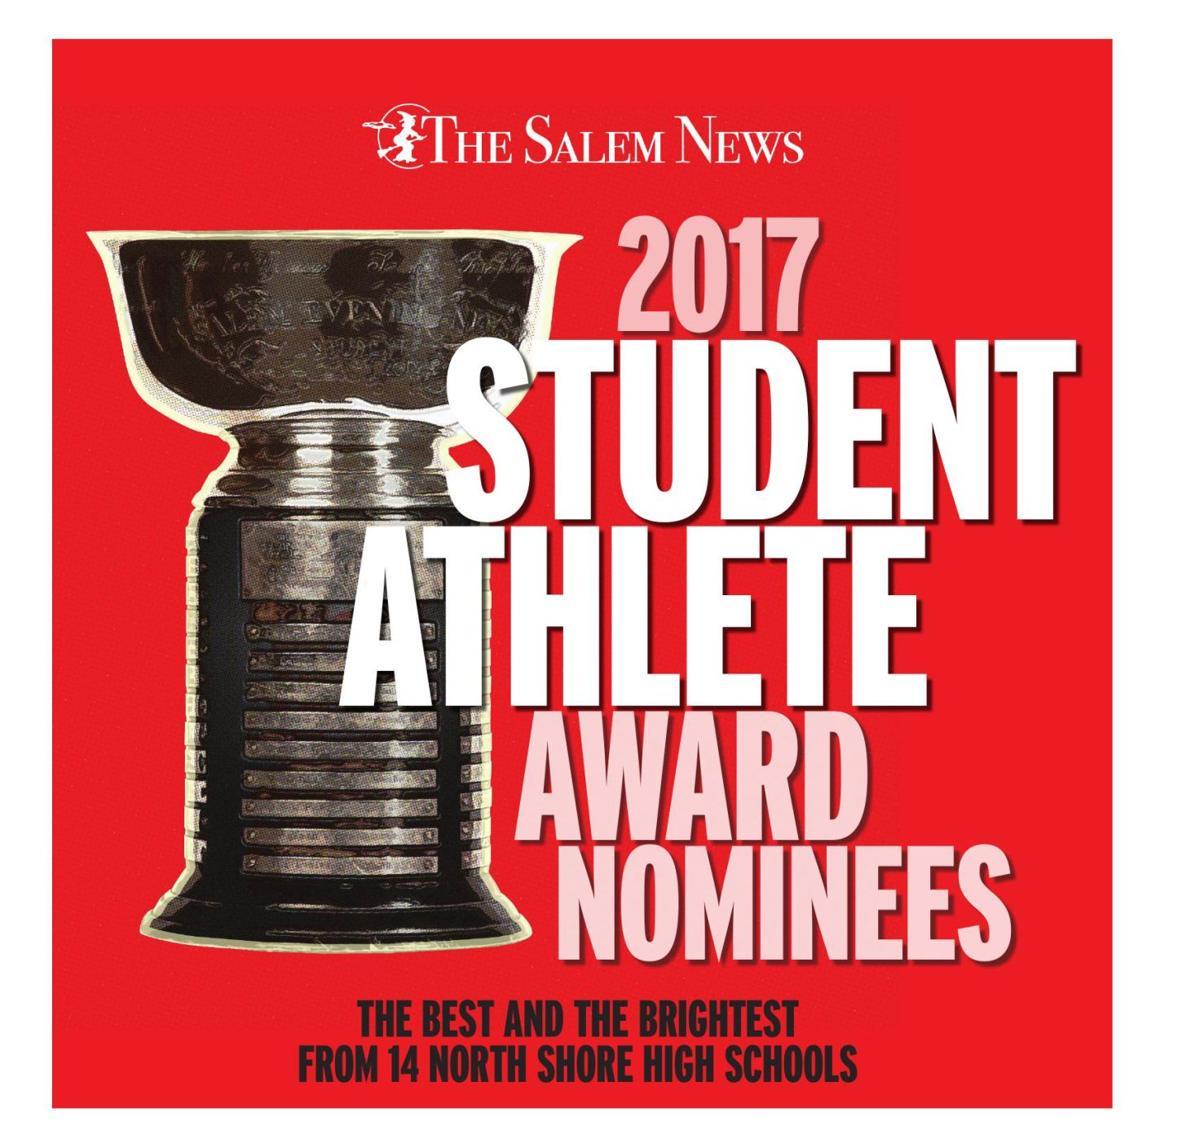 2017 Student Athlete Award Nominees